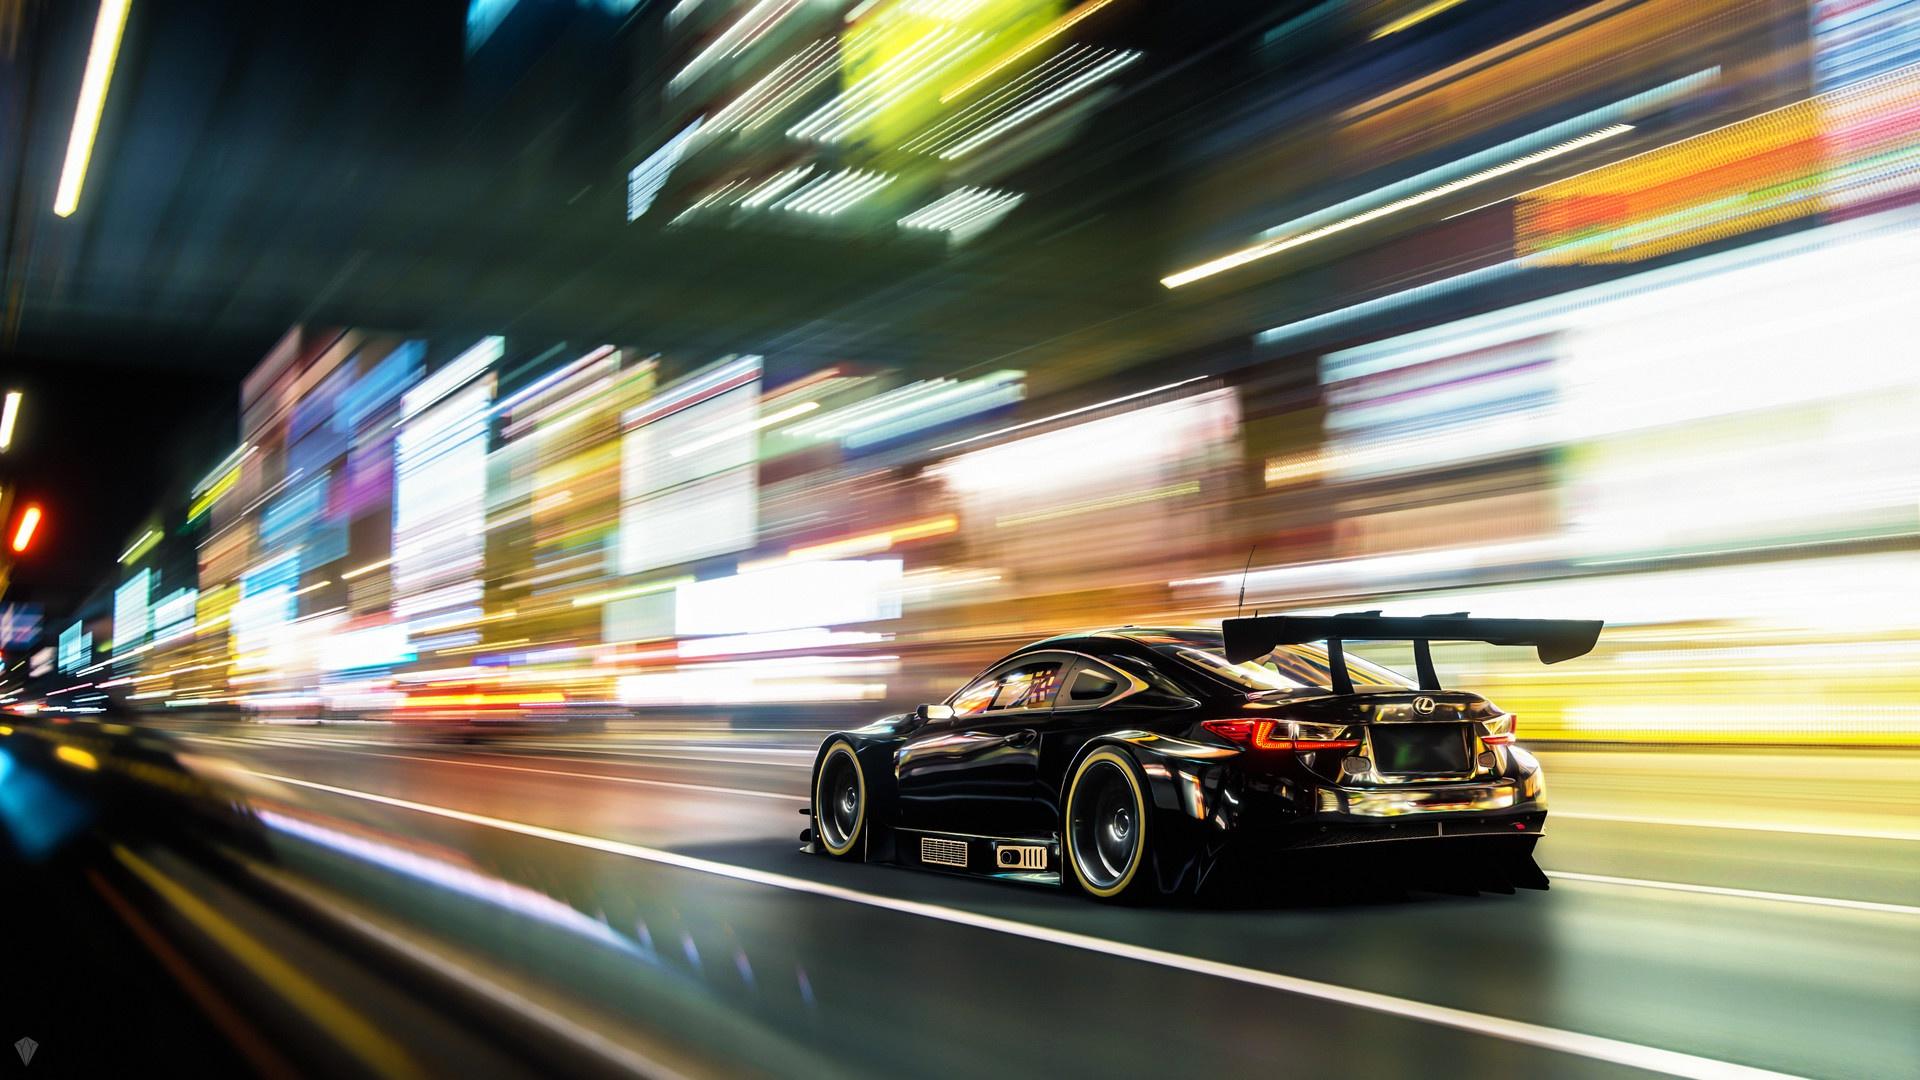 Wallpaper Lexus Rc F Car Vehicle 1920x1080 Wallpapermaniac 1513447 Hd Wallpapers Wallhere